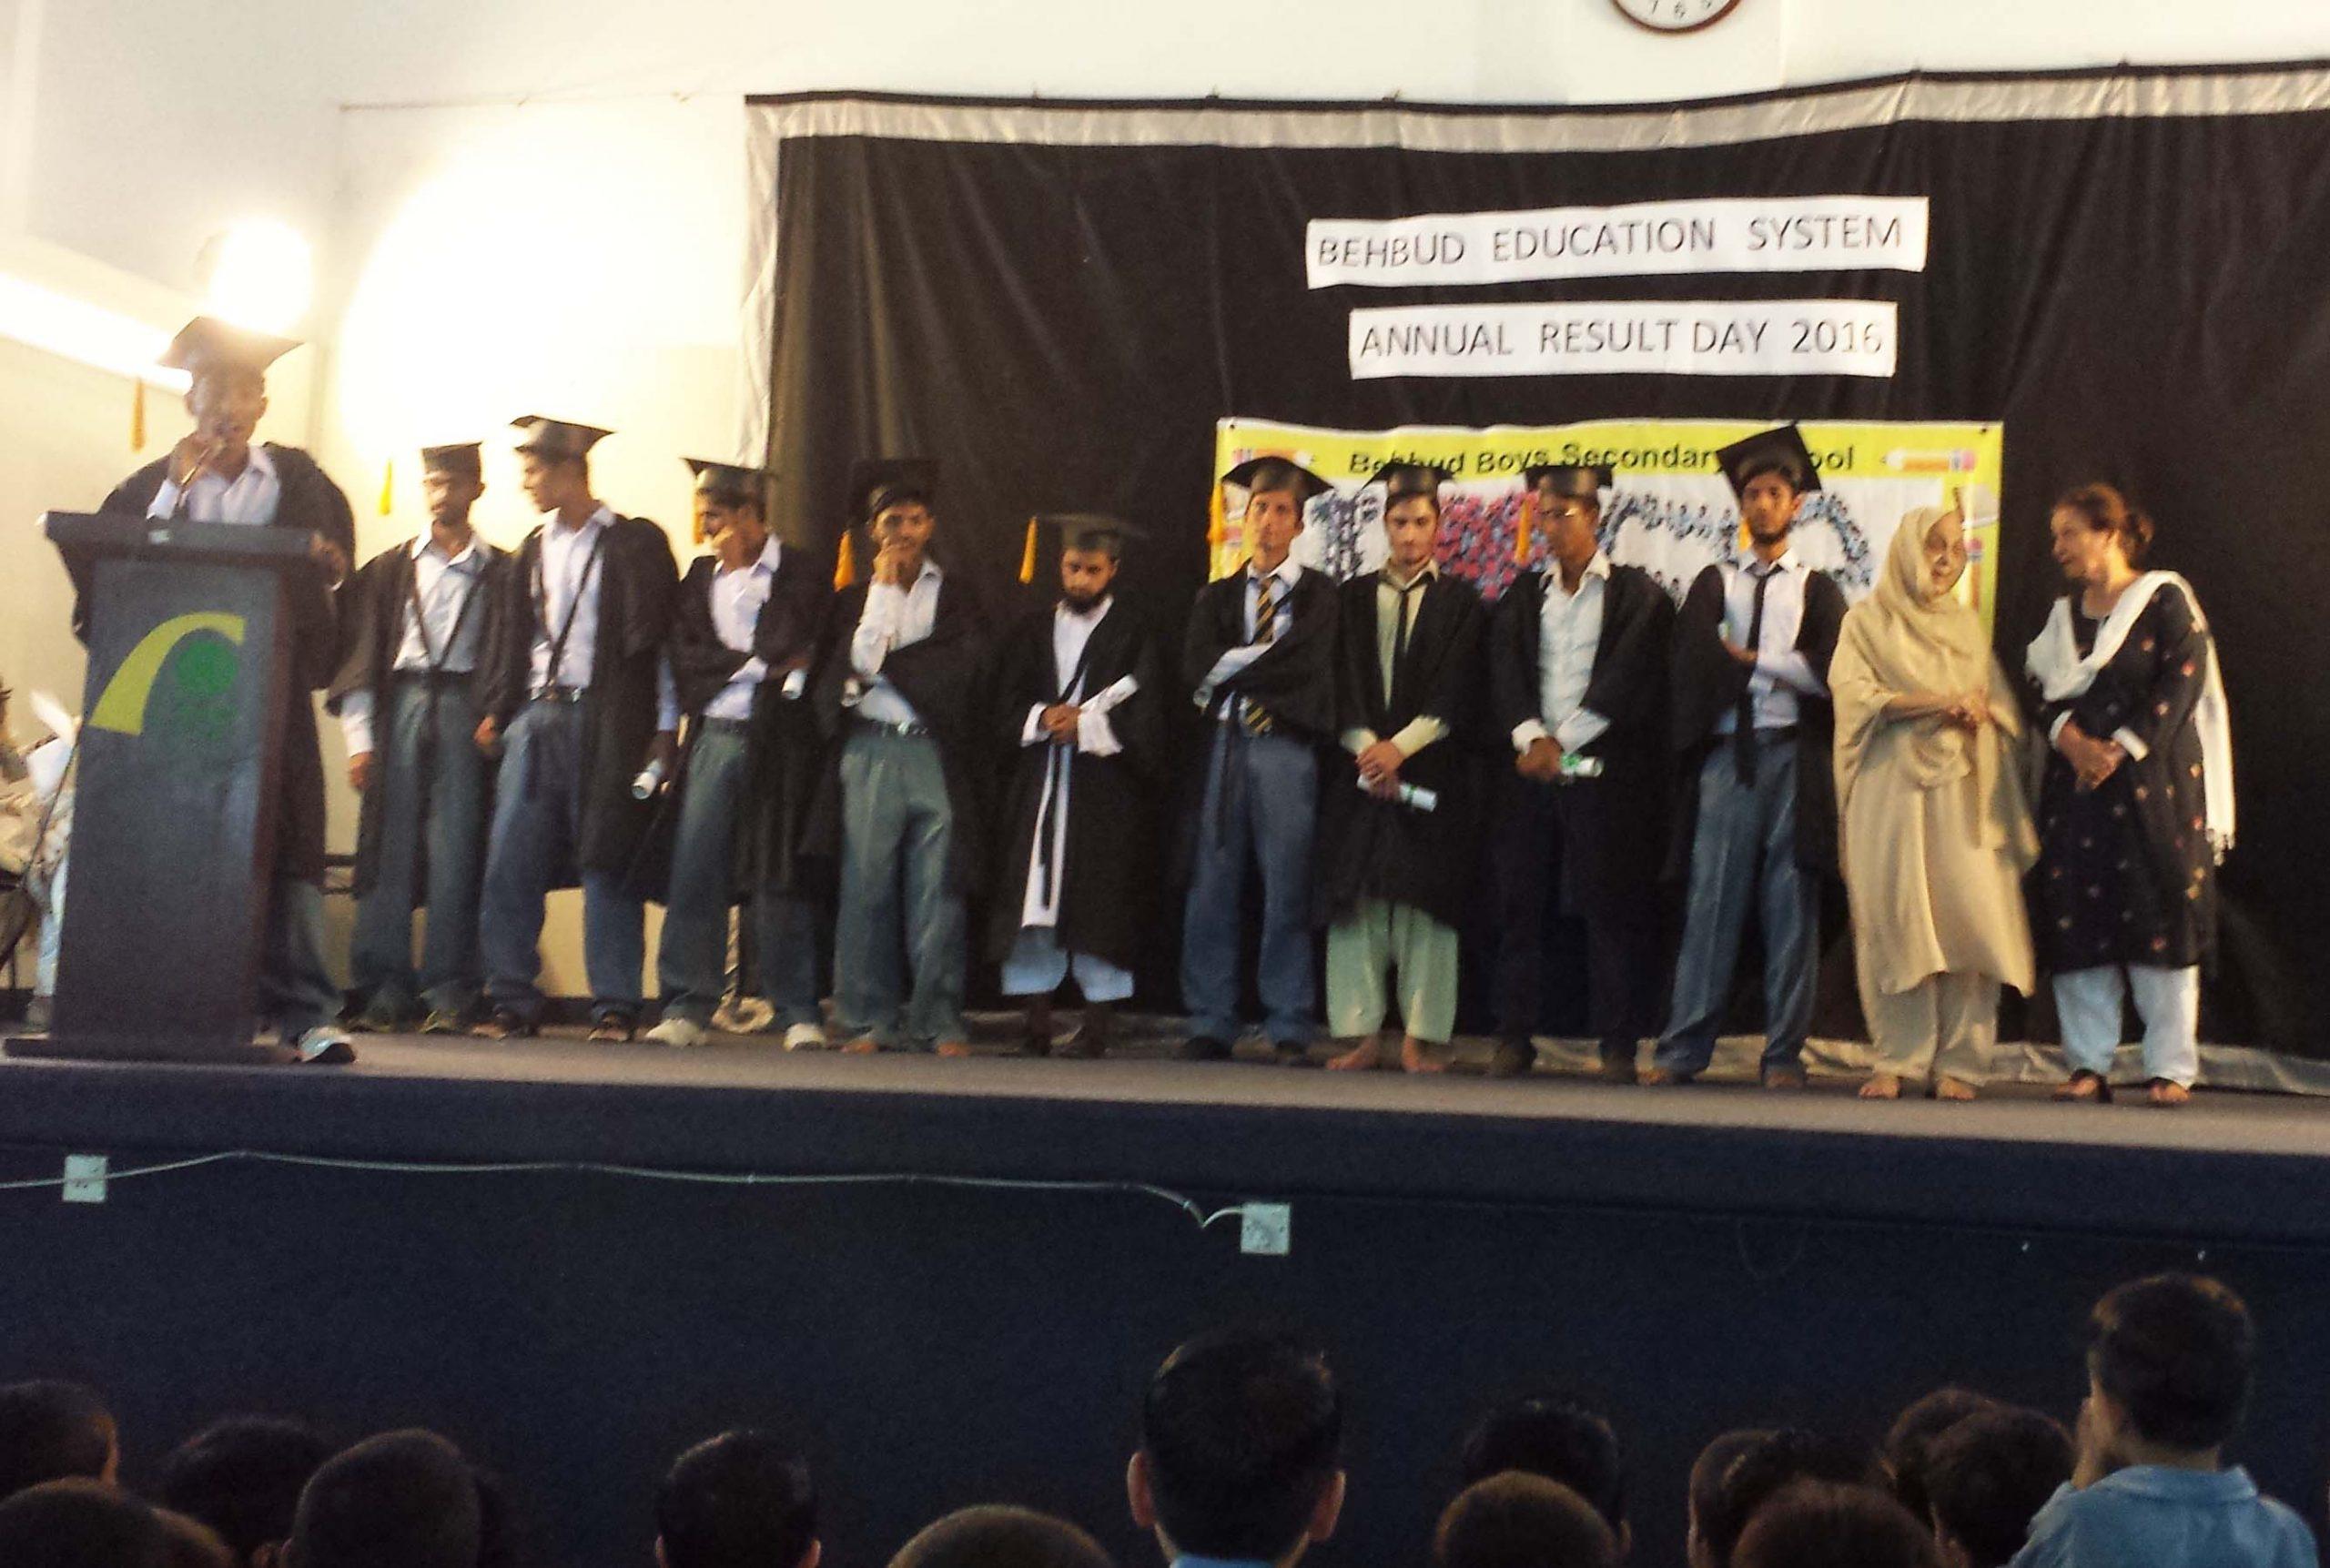 Behbud Boys Secondary School Annual Result Day